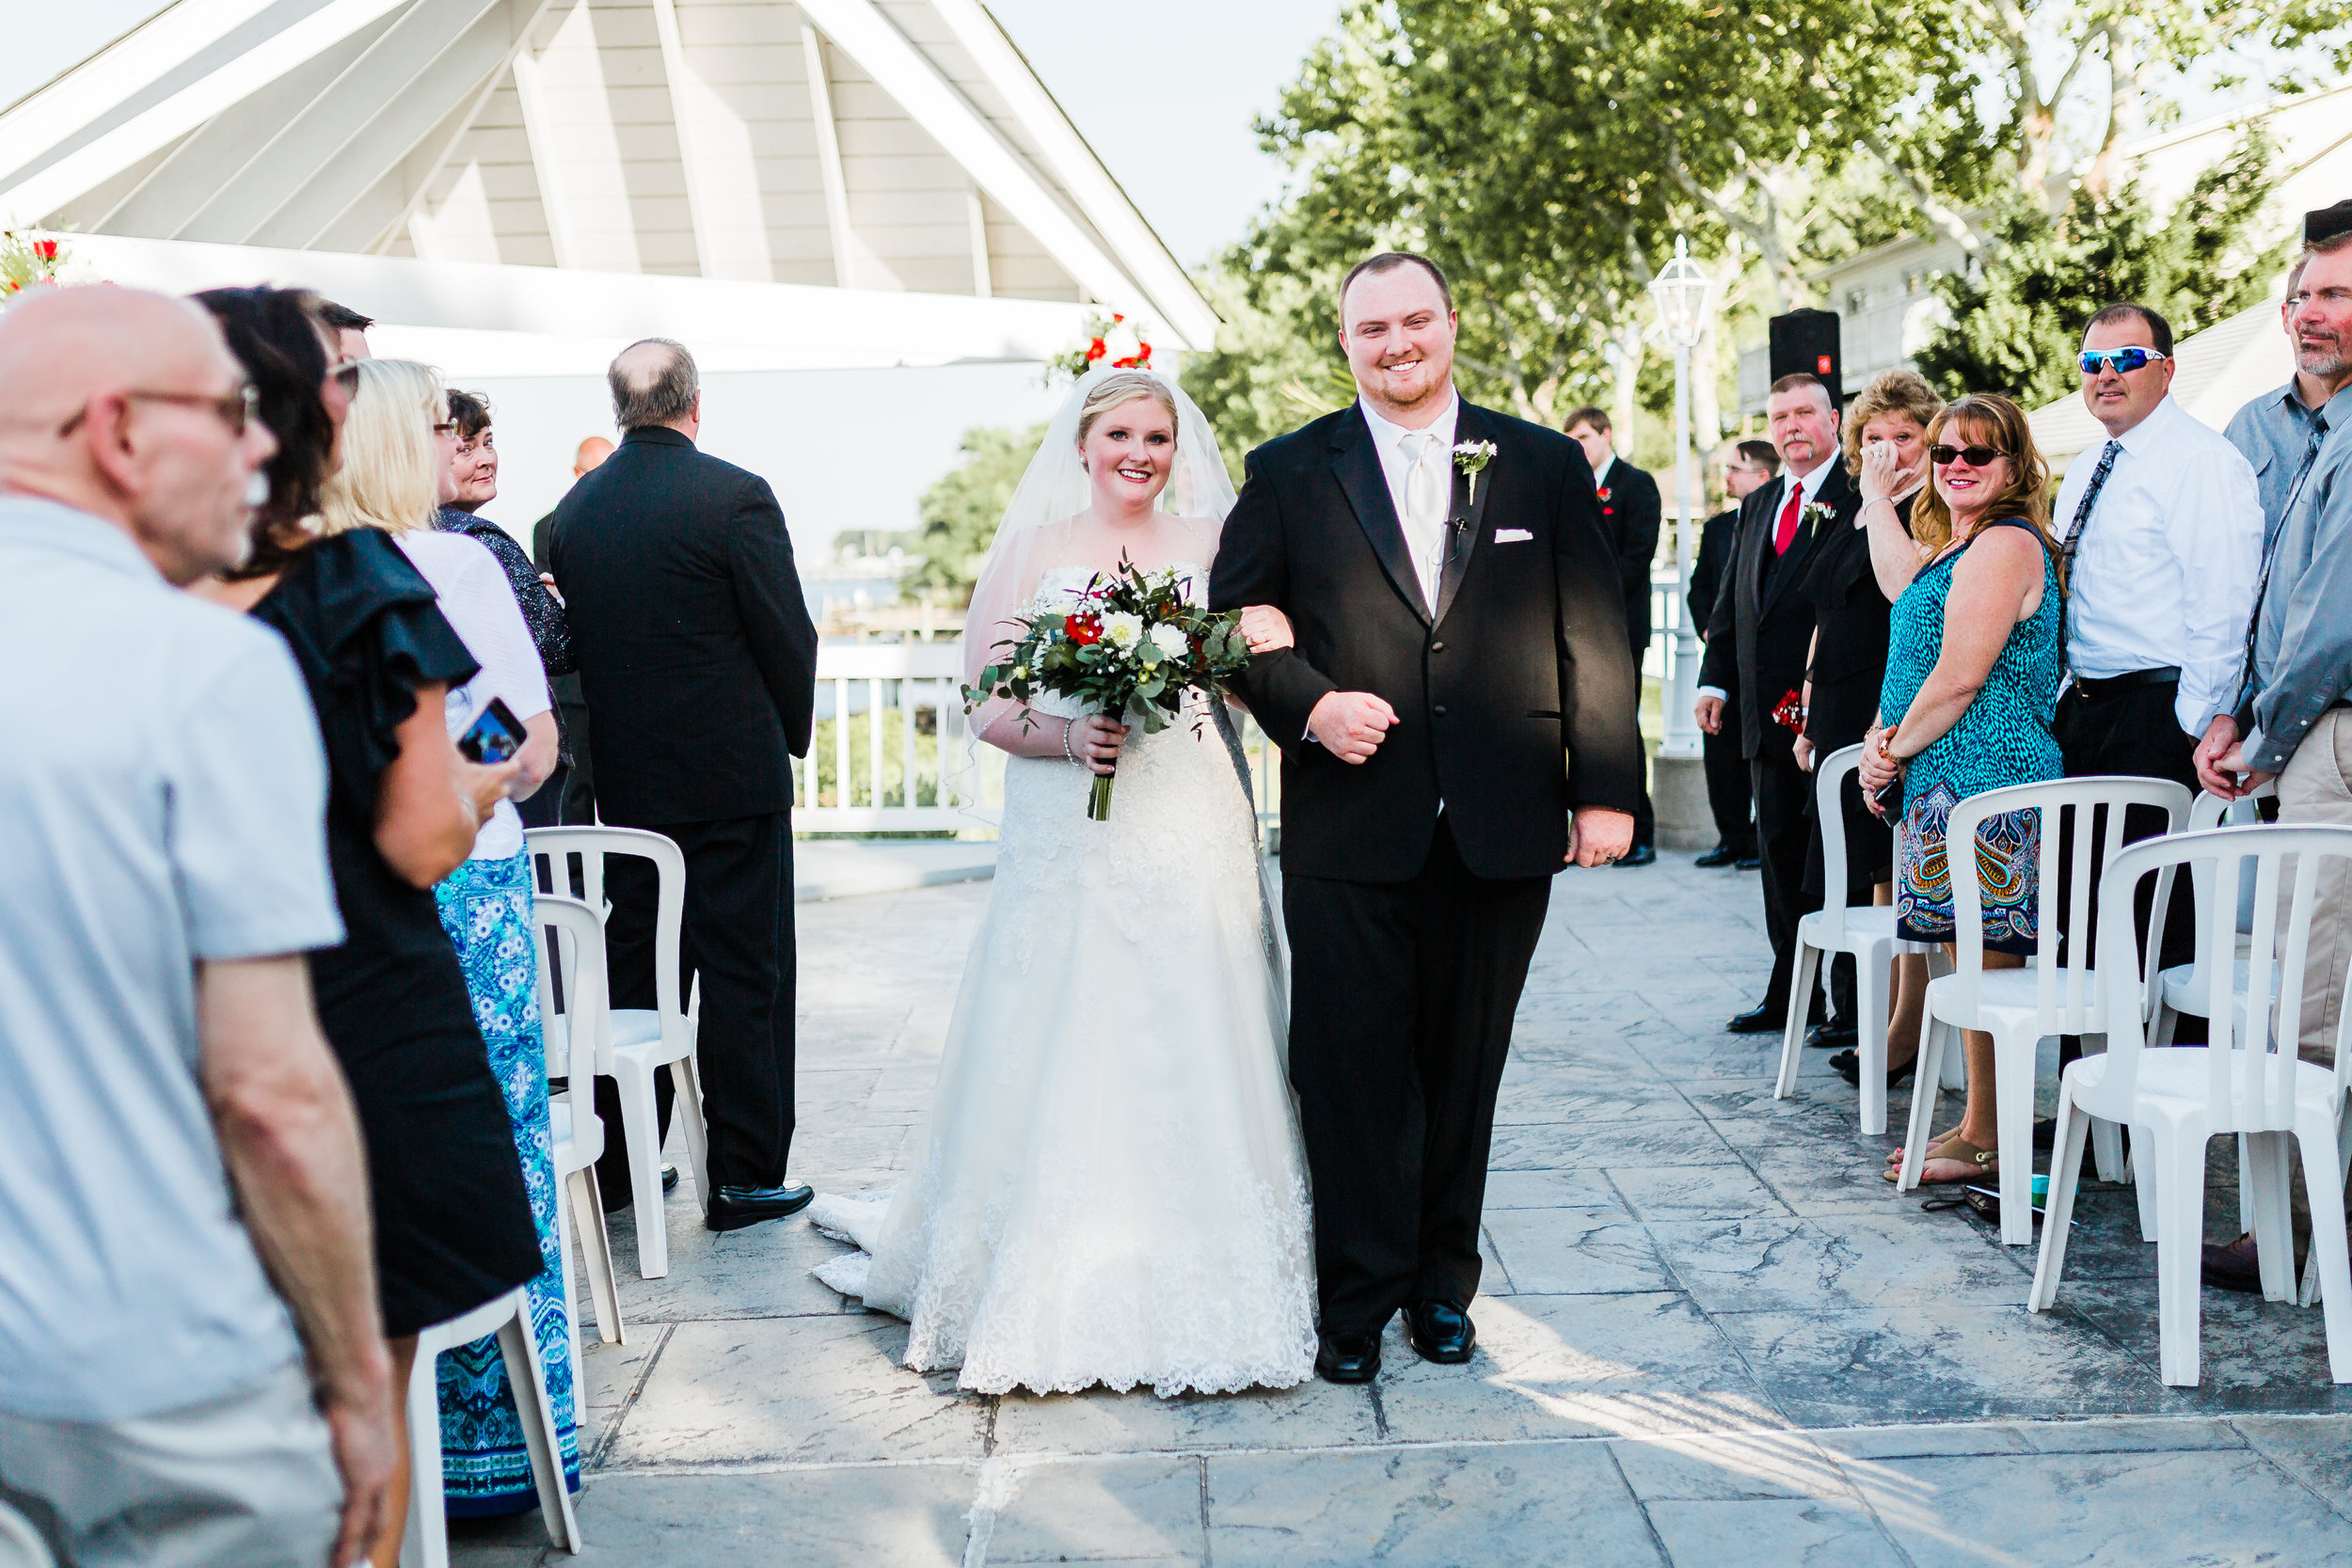 waterfront wedding venues in maryland - bayside wedding ceremony - best md wedding photographer